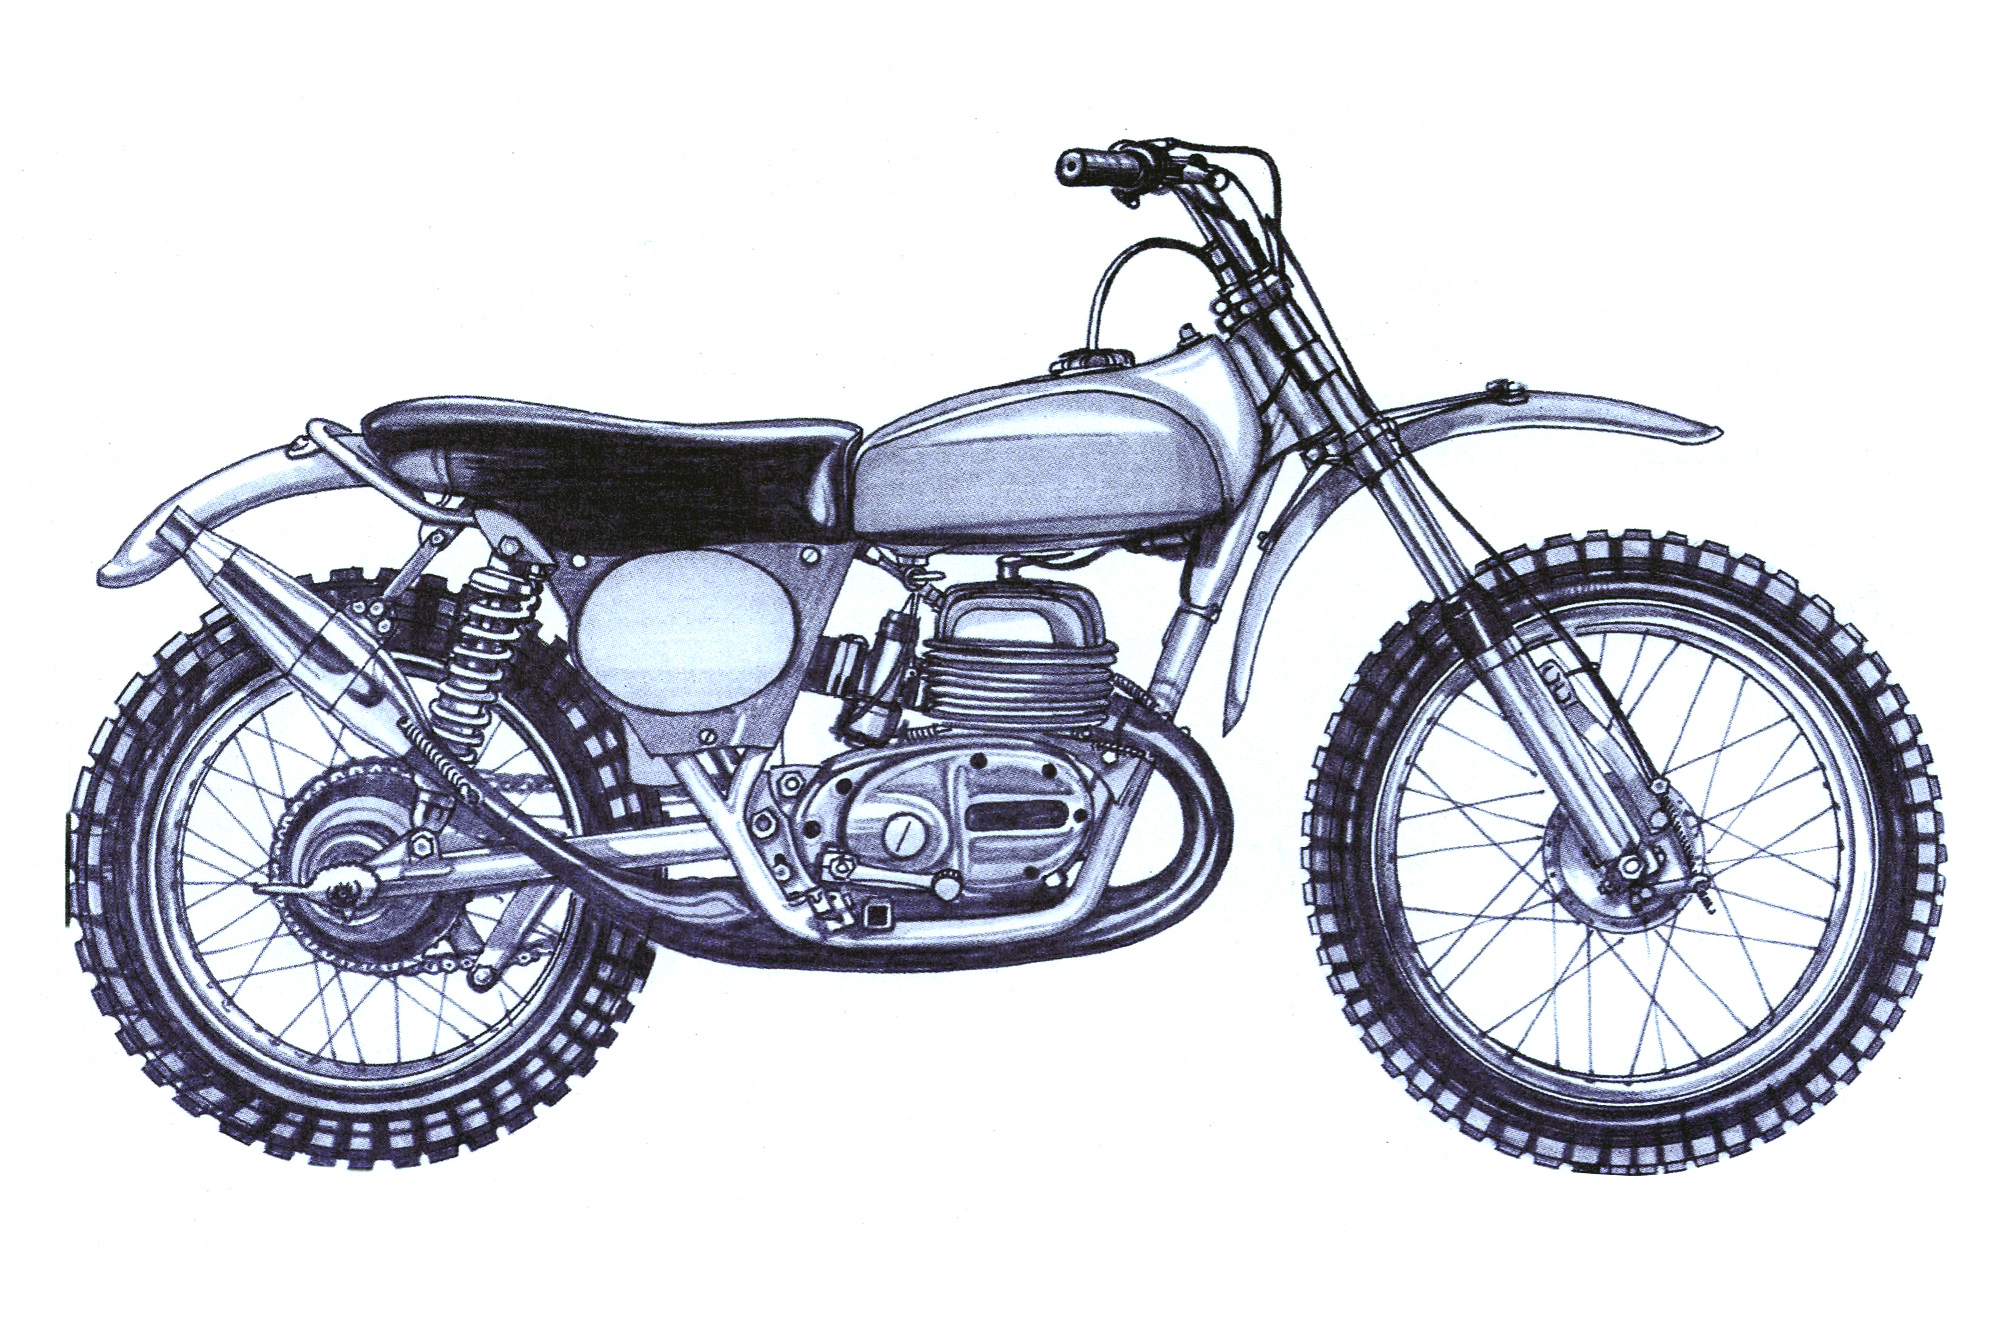 an illustration of an old Australian moto-cross bike